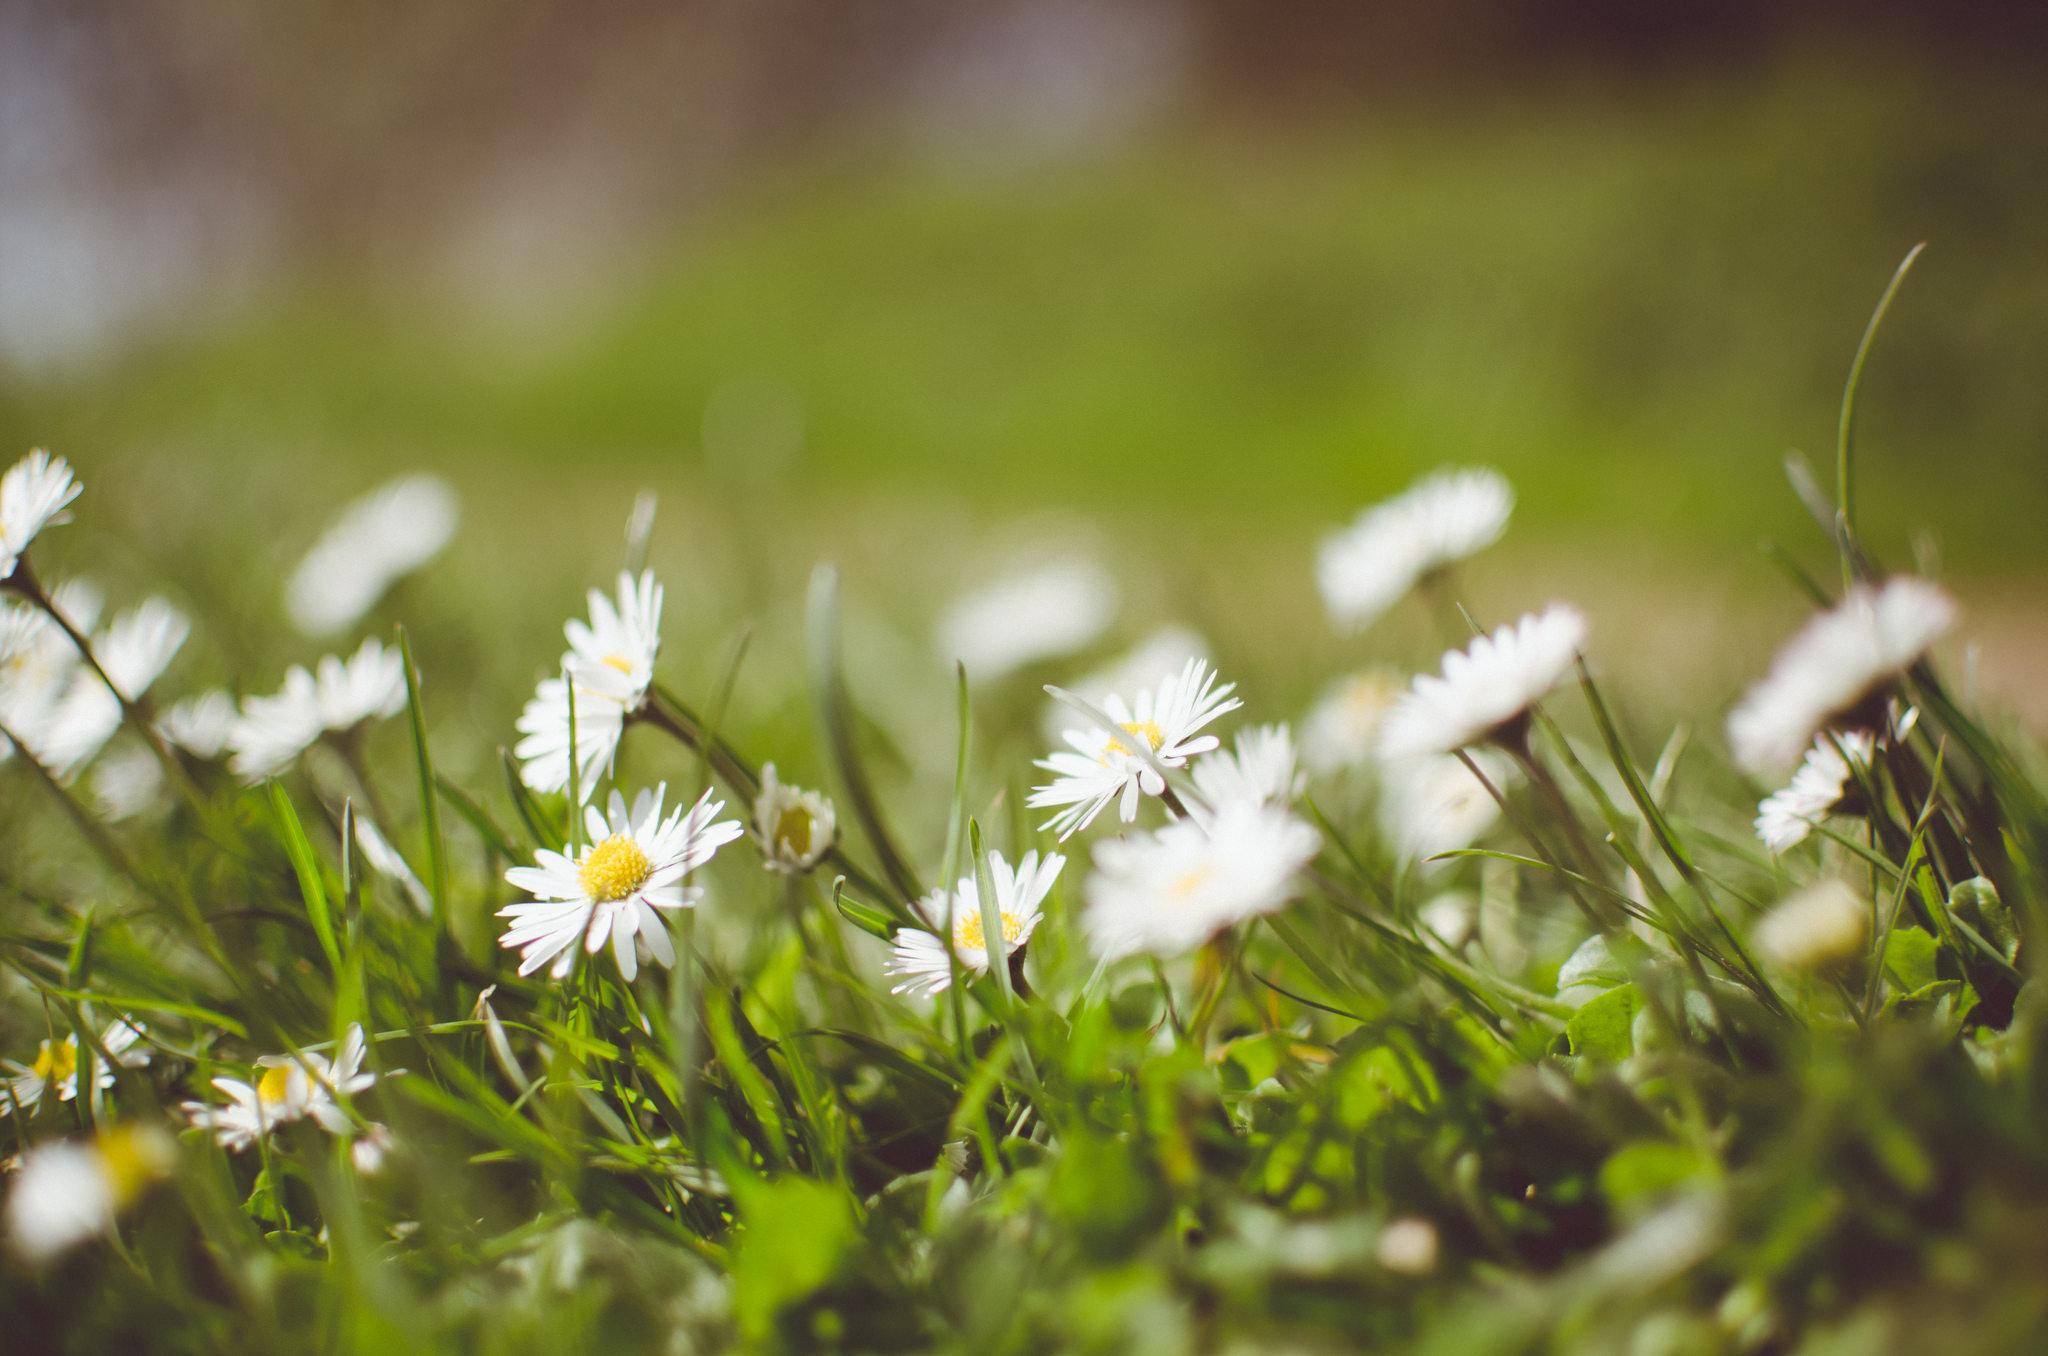 ромашки трава chamomile grass  № 3837875 загрузить